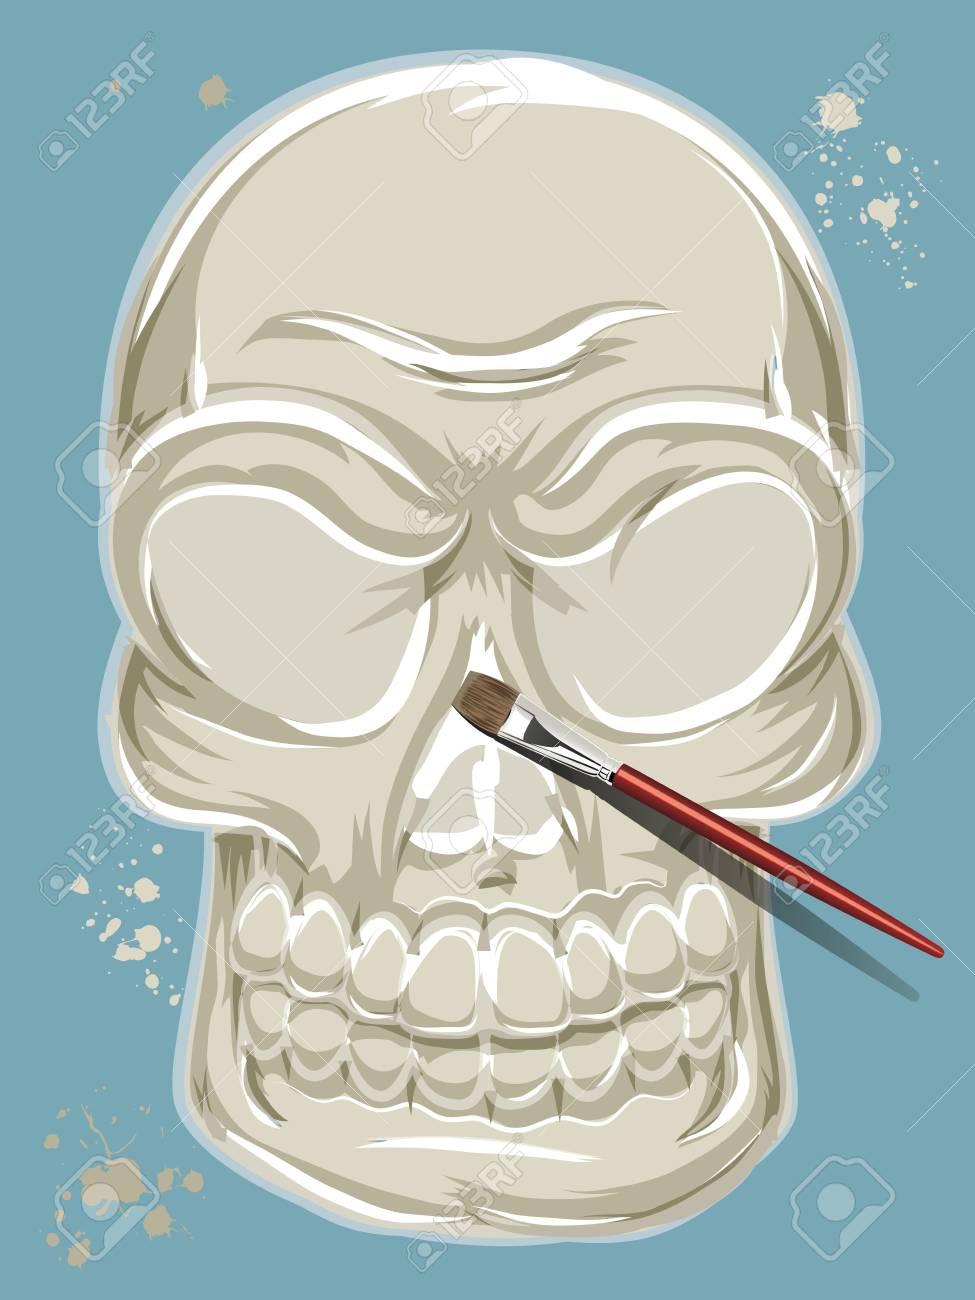 Painted Skull Stock Vector - 15463169